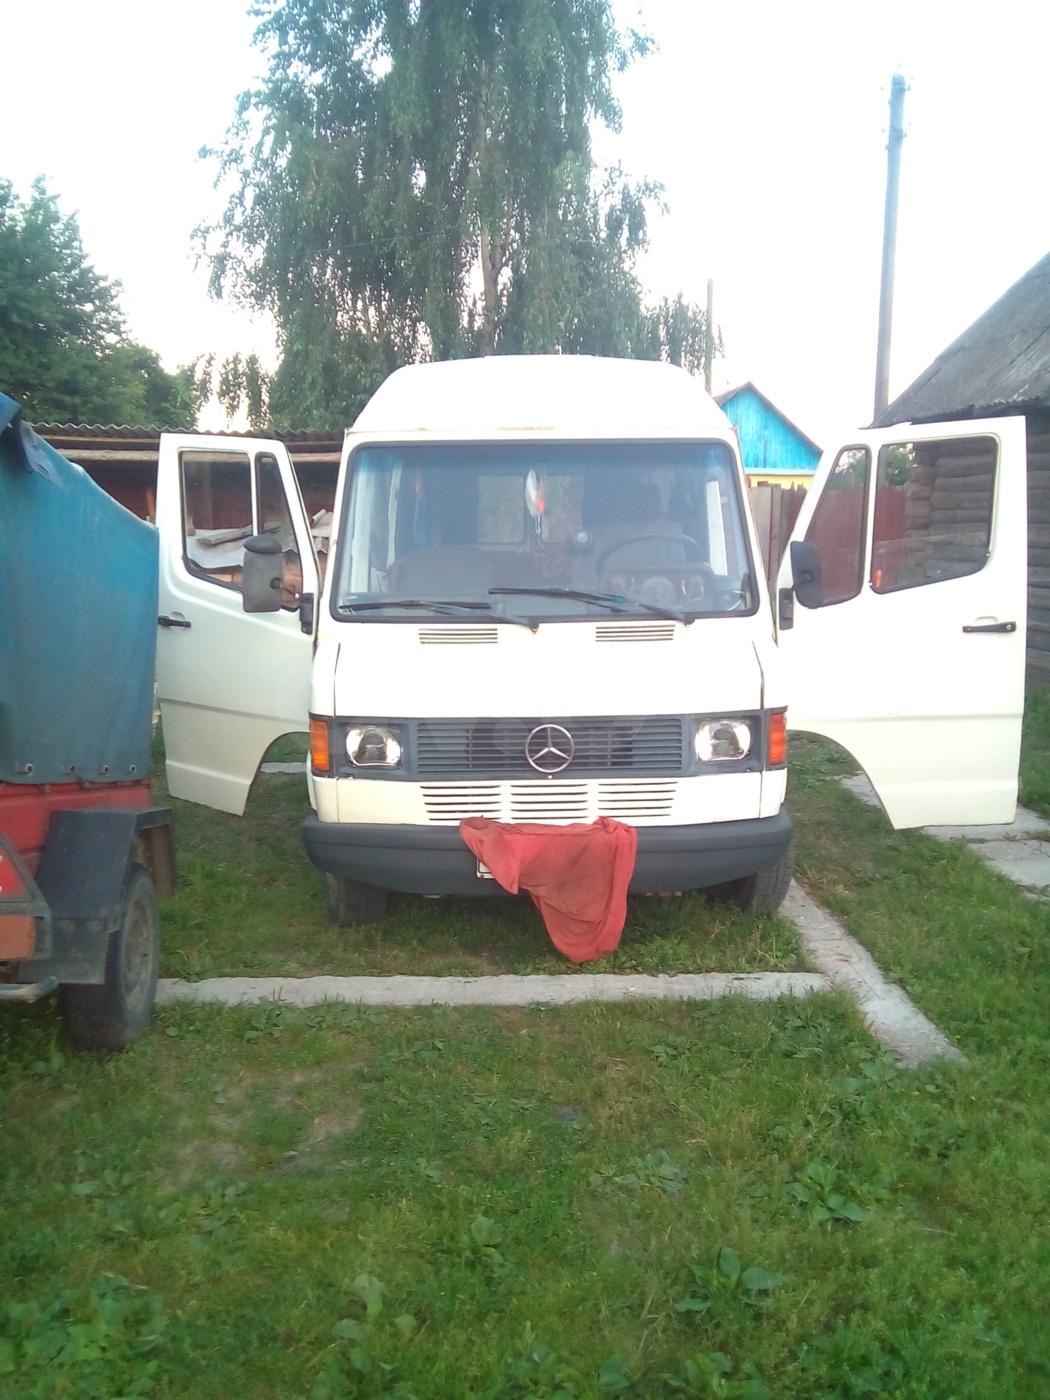 Mercedes-Benz T1 (207D-410D) мерс, 1988 г.